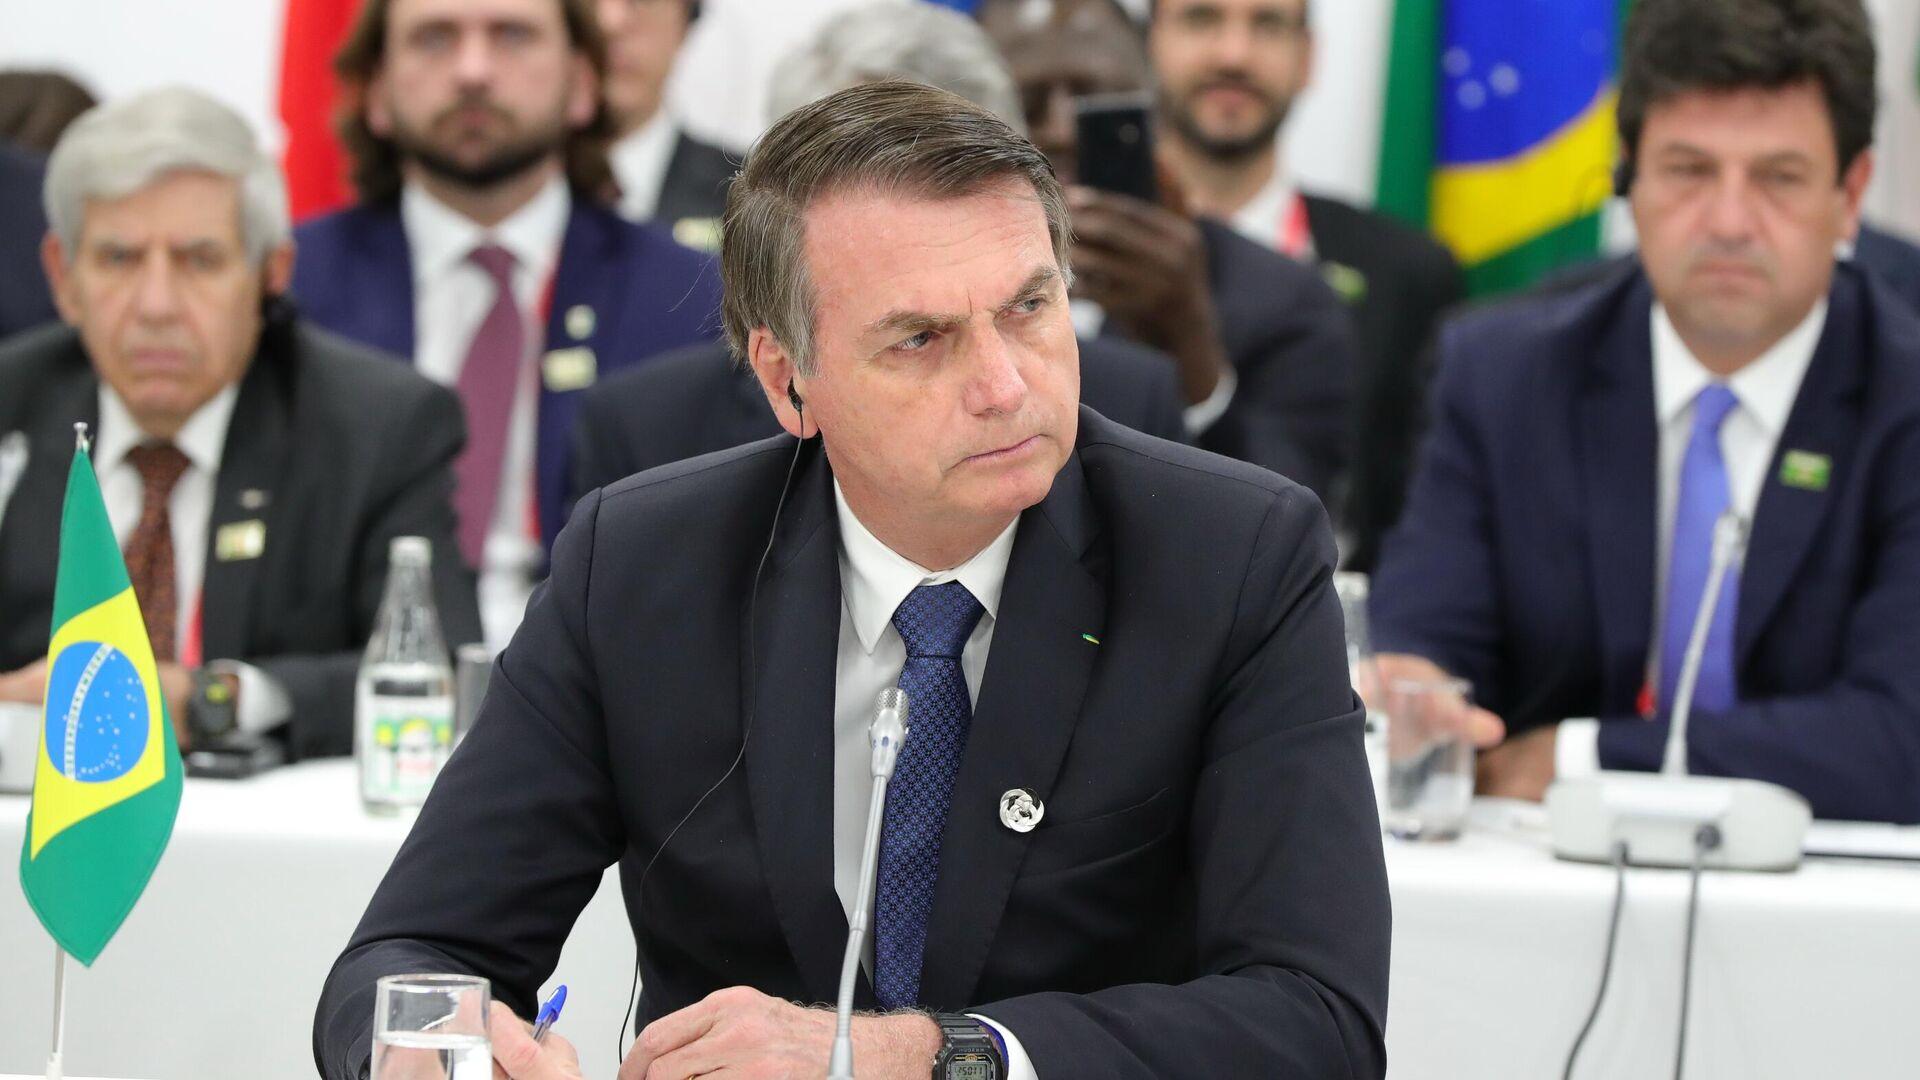 Prezident Brazilii Jair Bolsonaru - Sputnik Oʻzbekiston, 1920, 21.09.2021